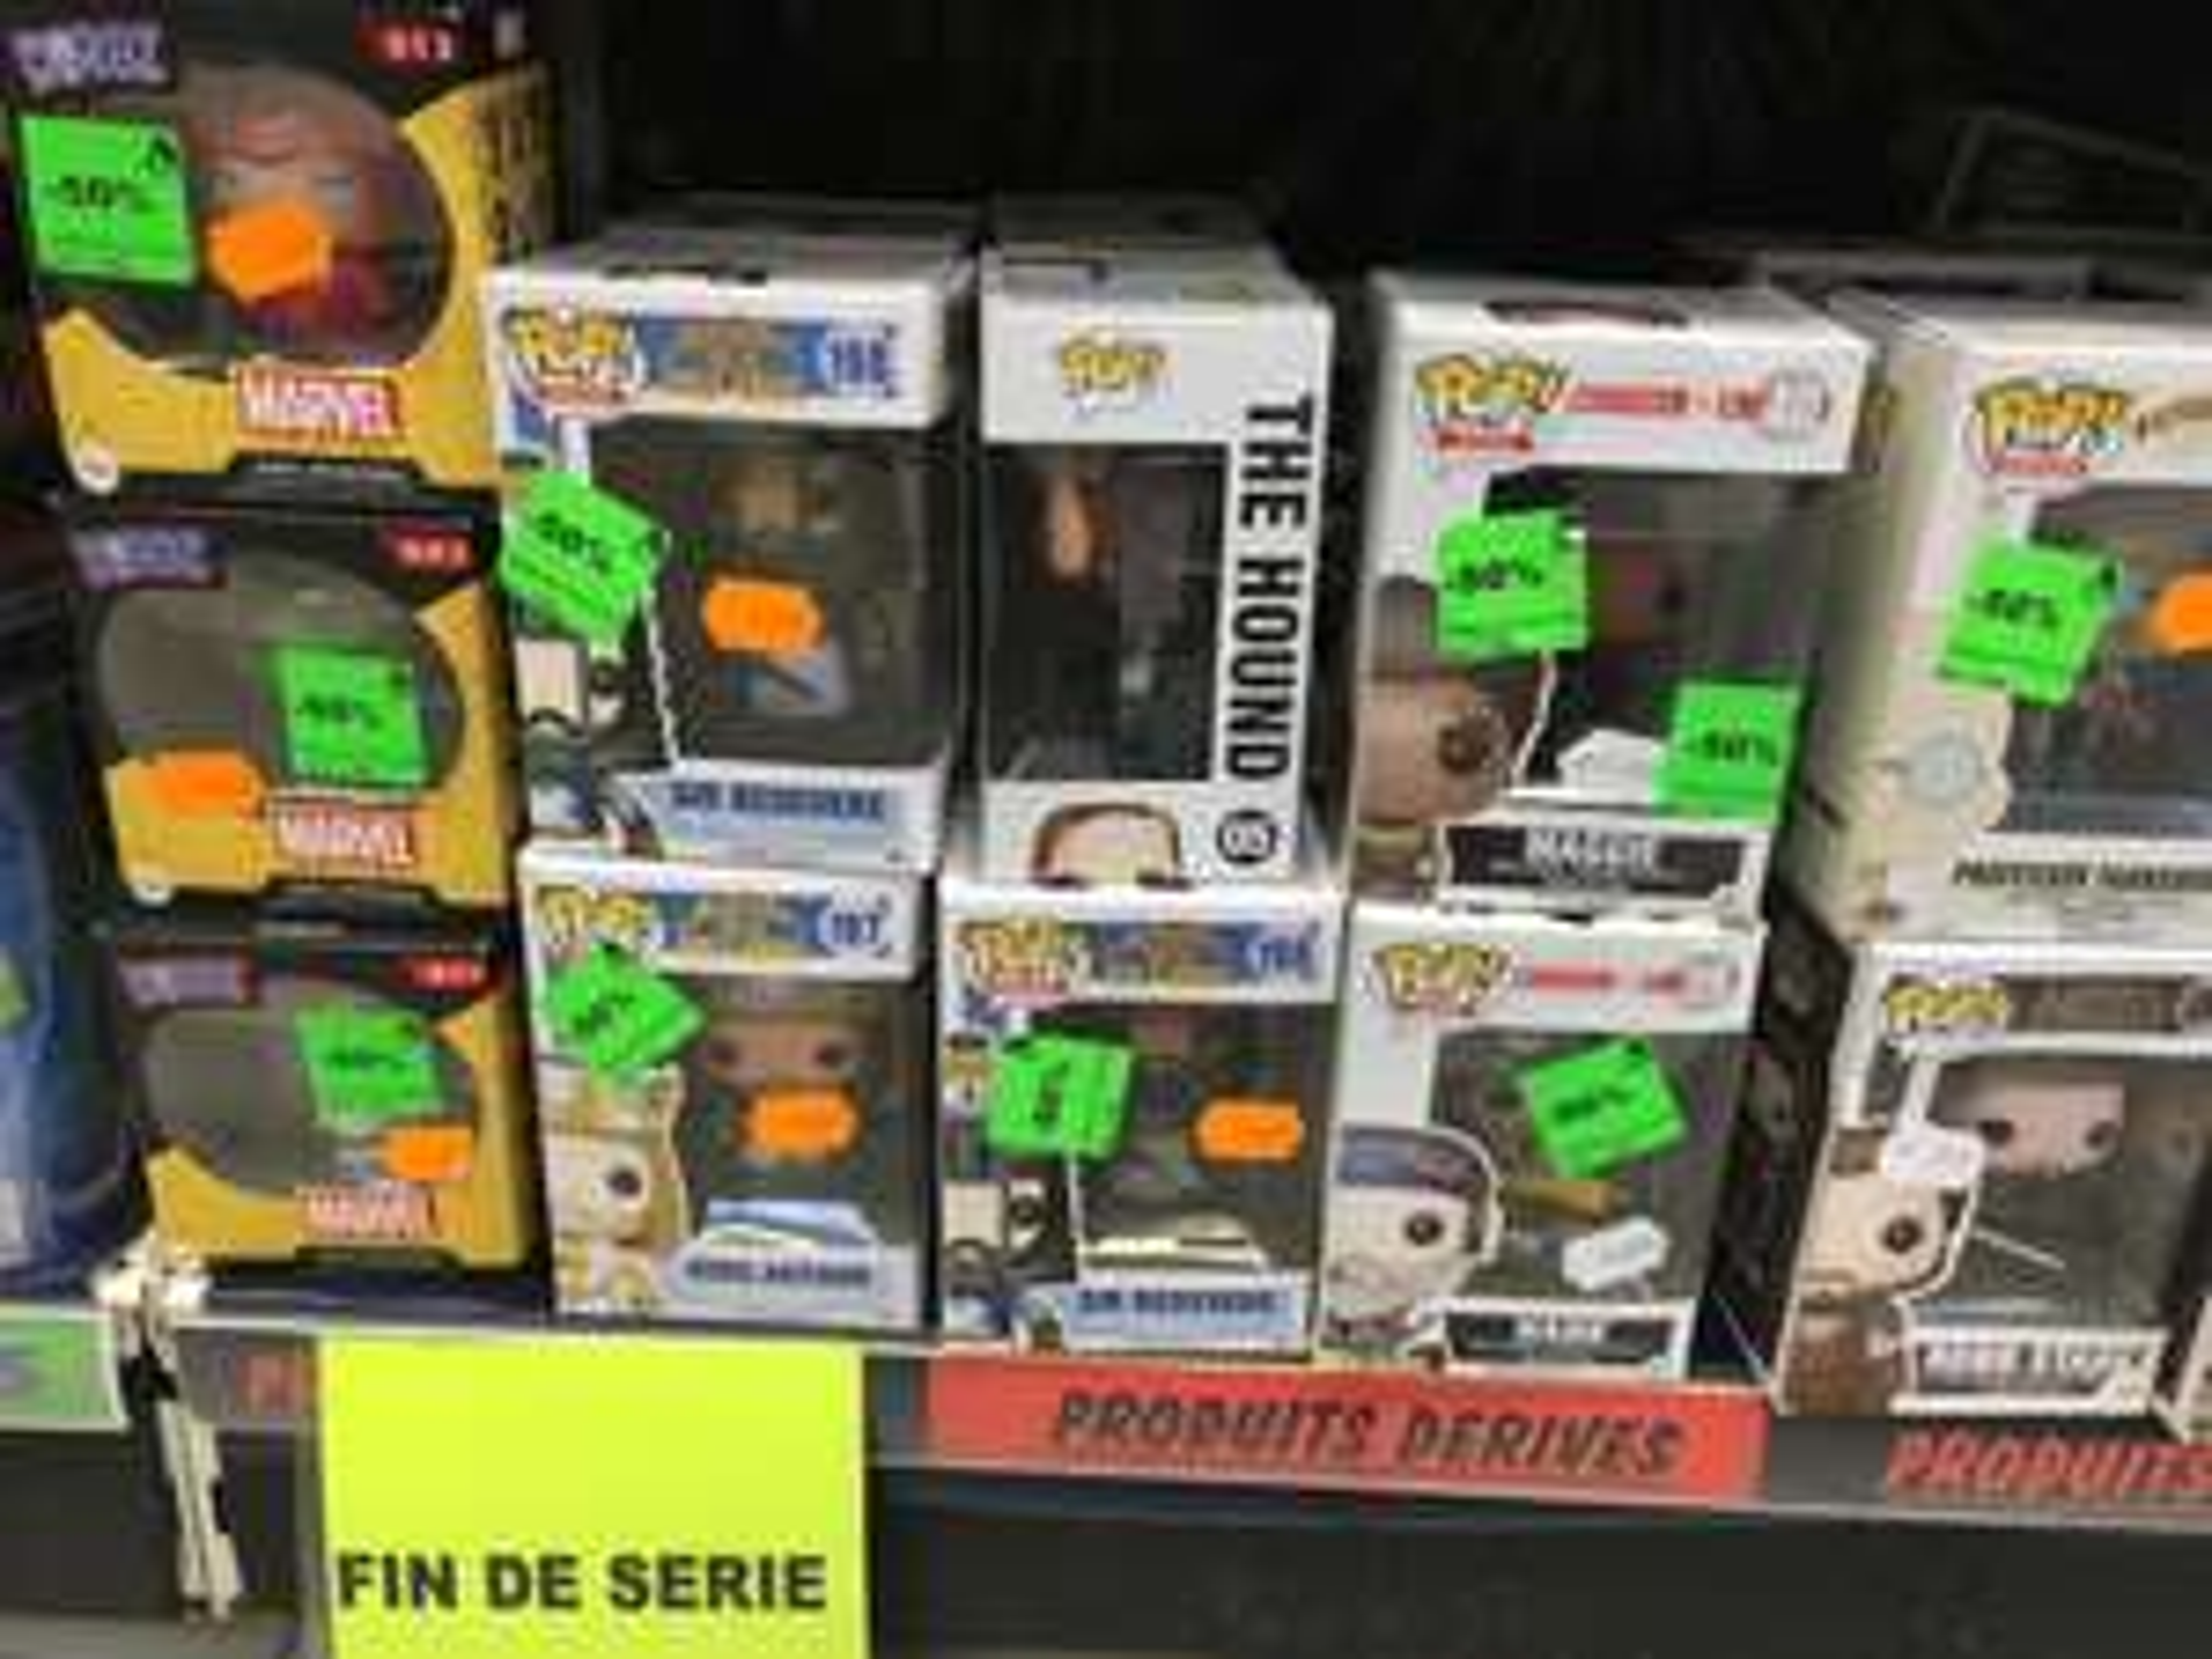 Sélection de figurines Pop! en promotion - Ex : Futurama, Vikings, Game Of Thrones...